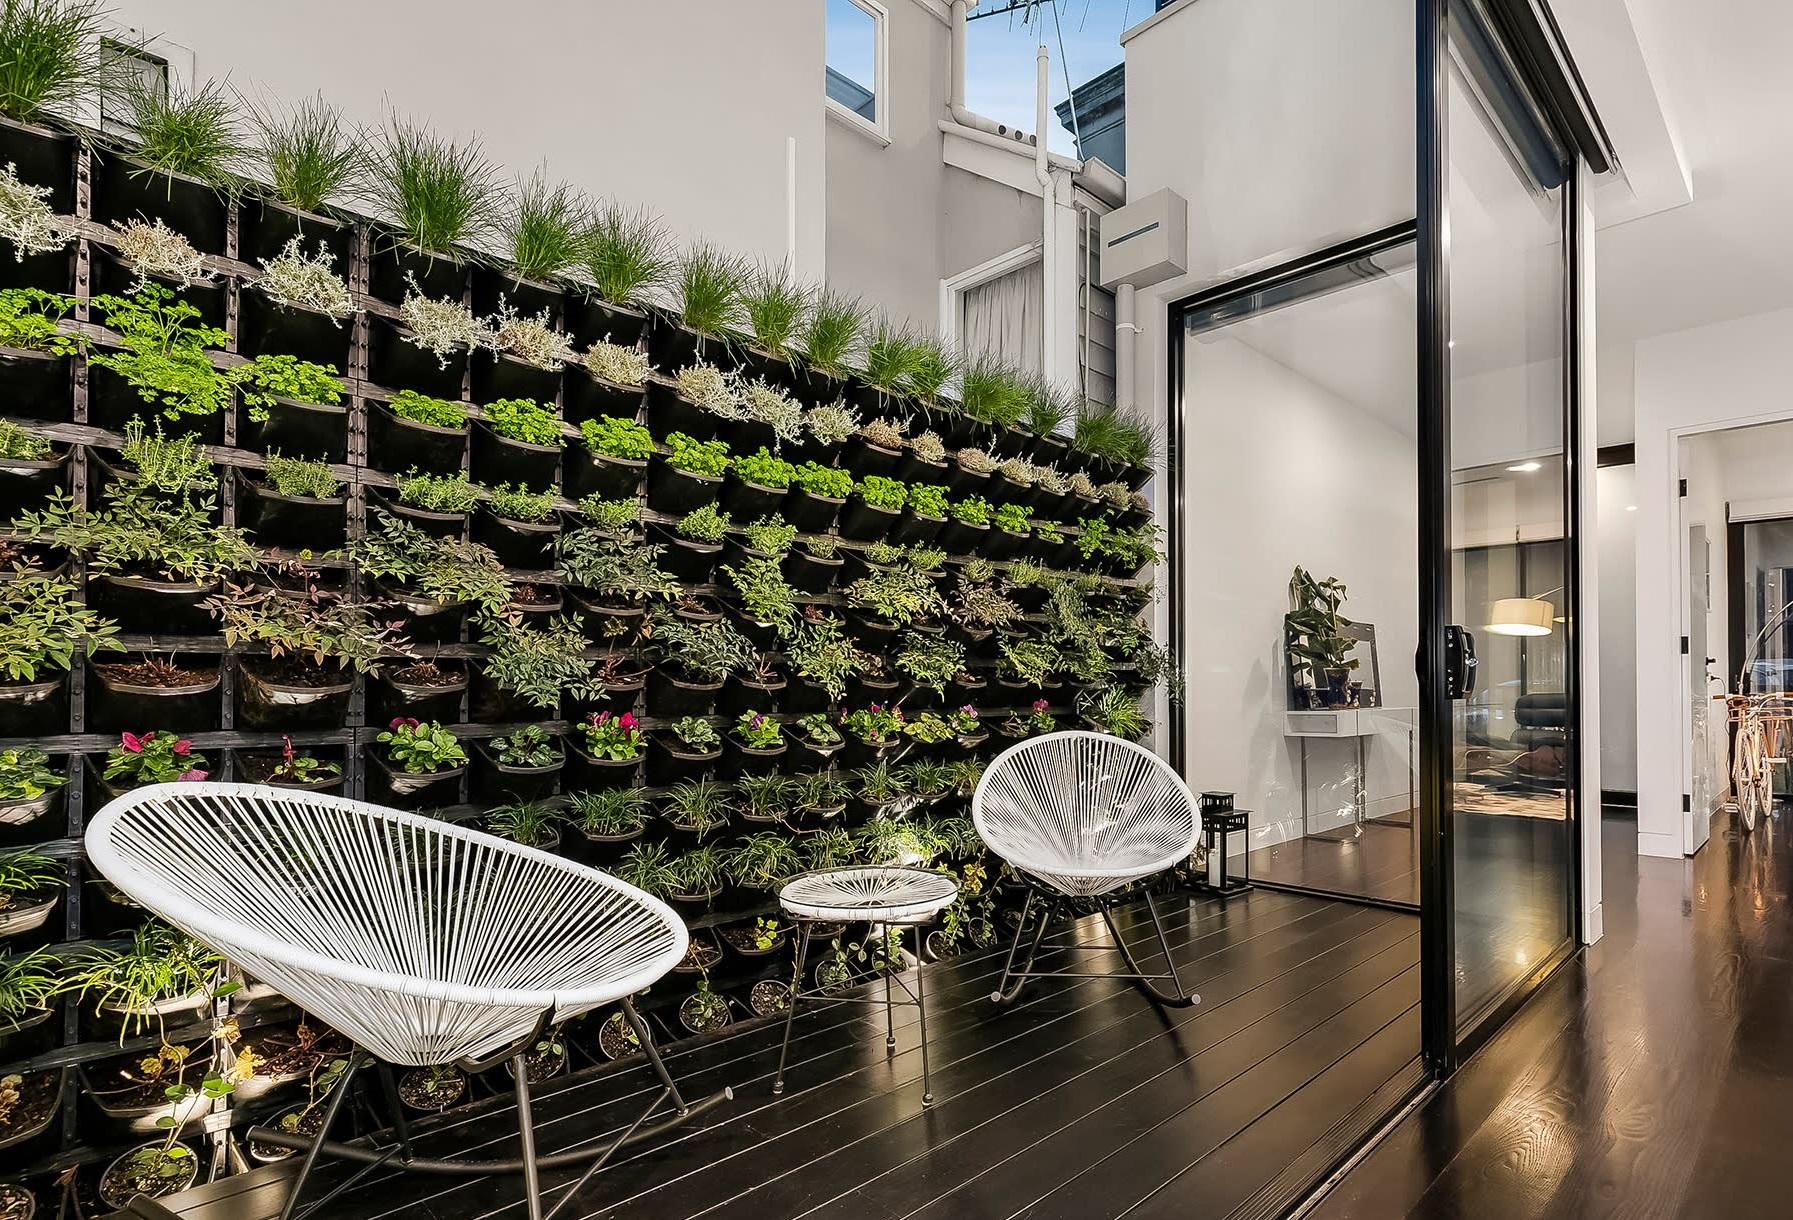 Mur de plantes créatif.